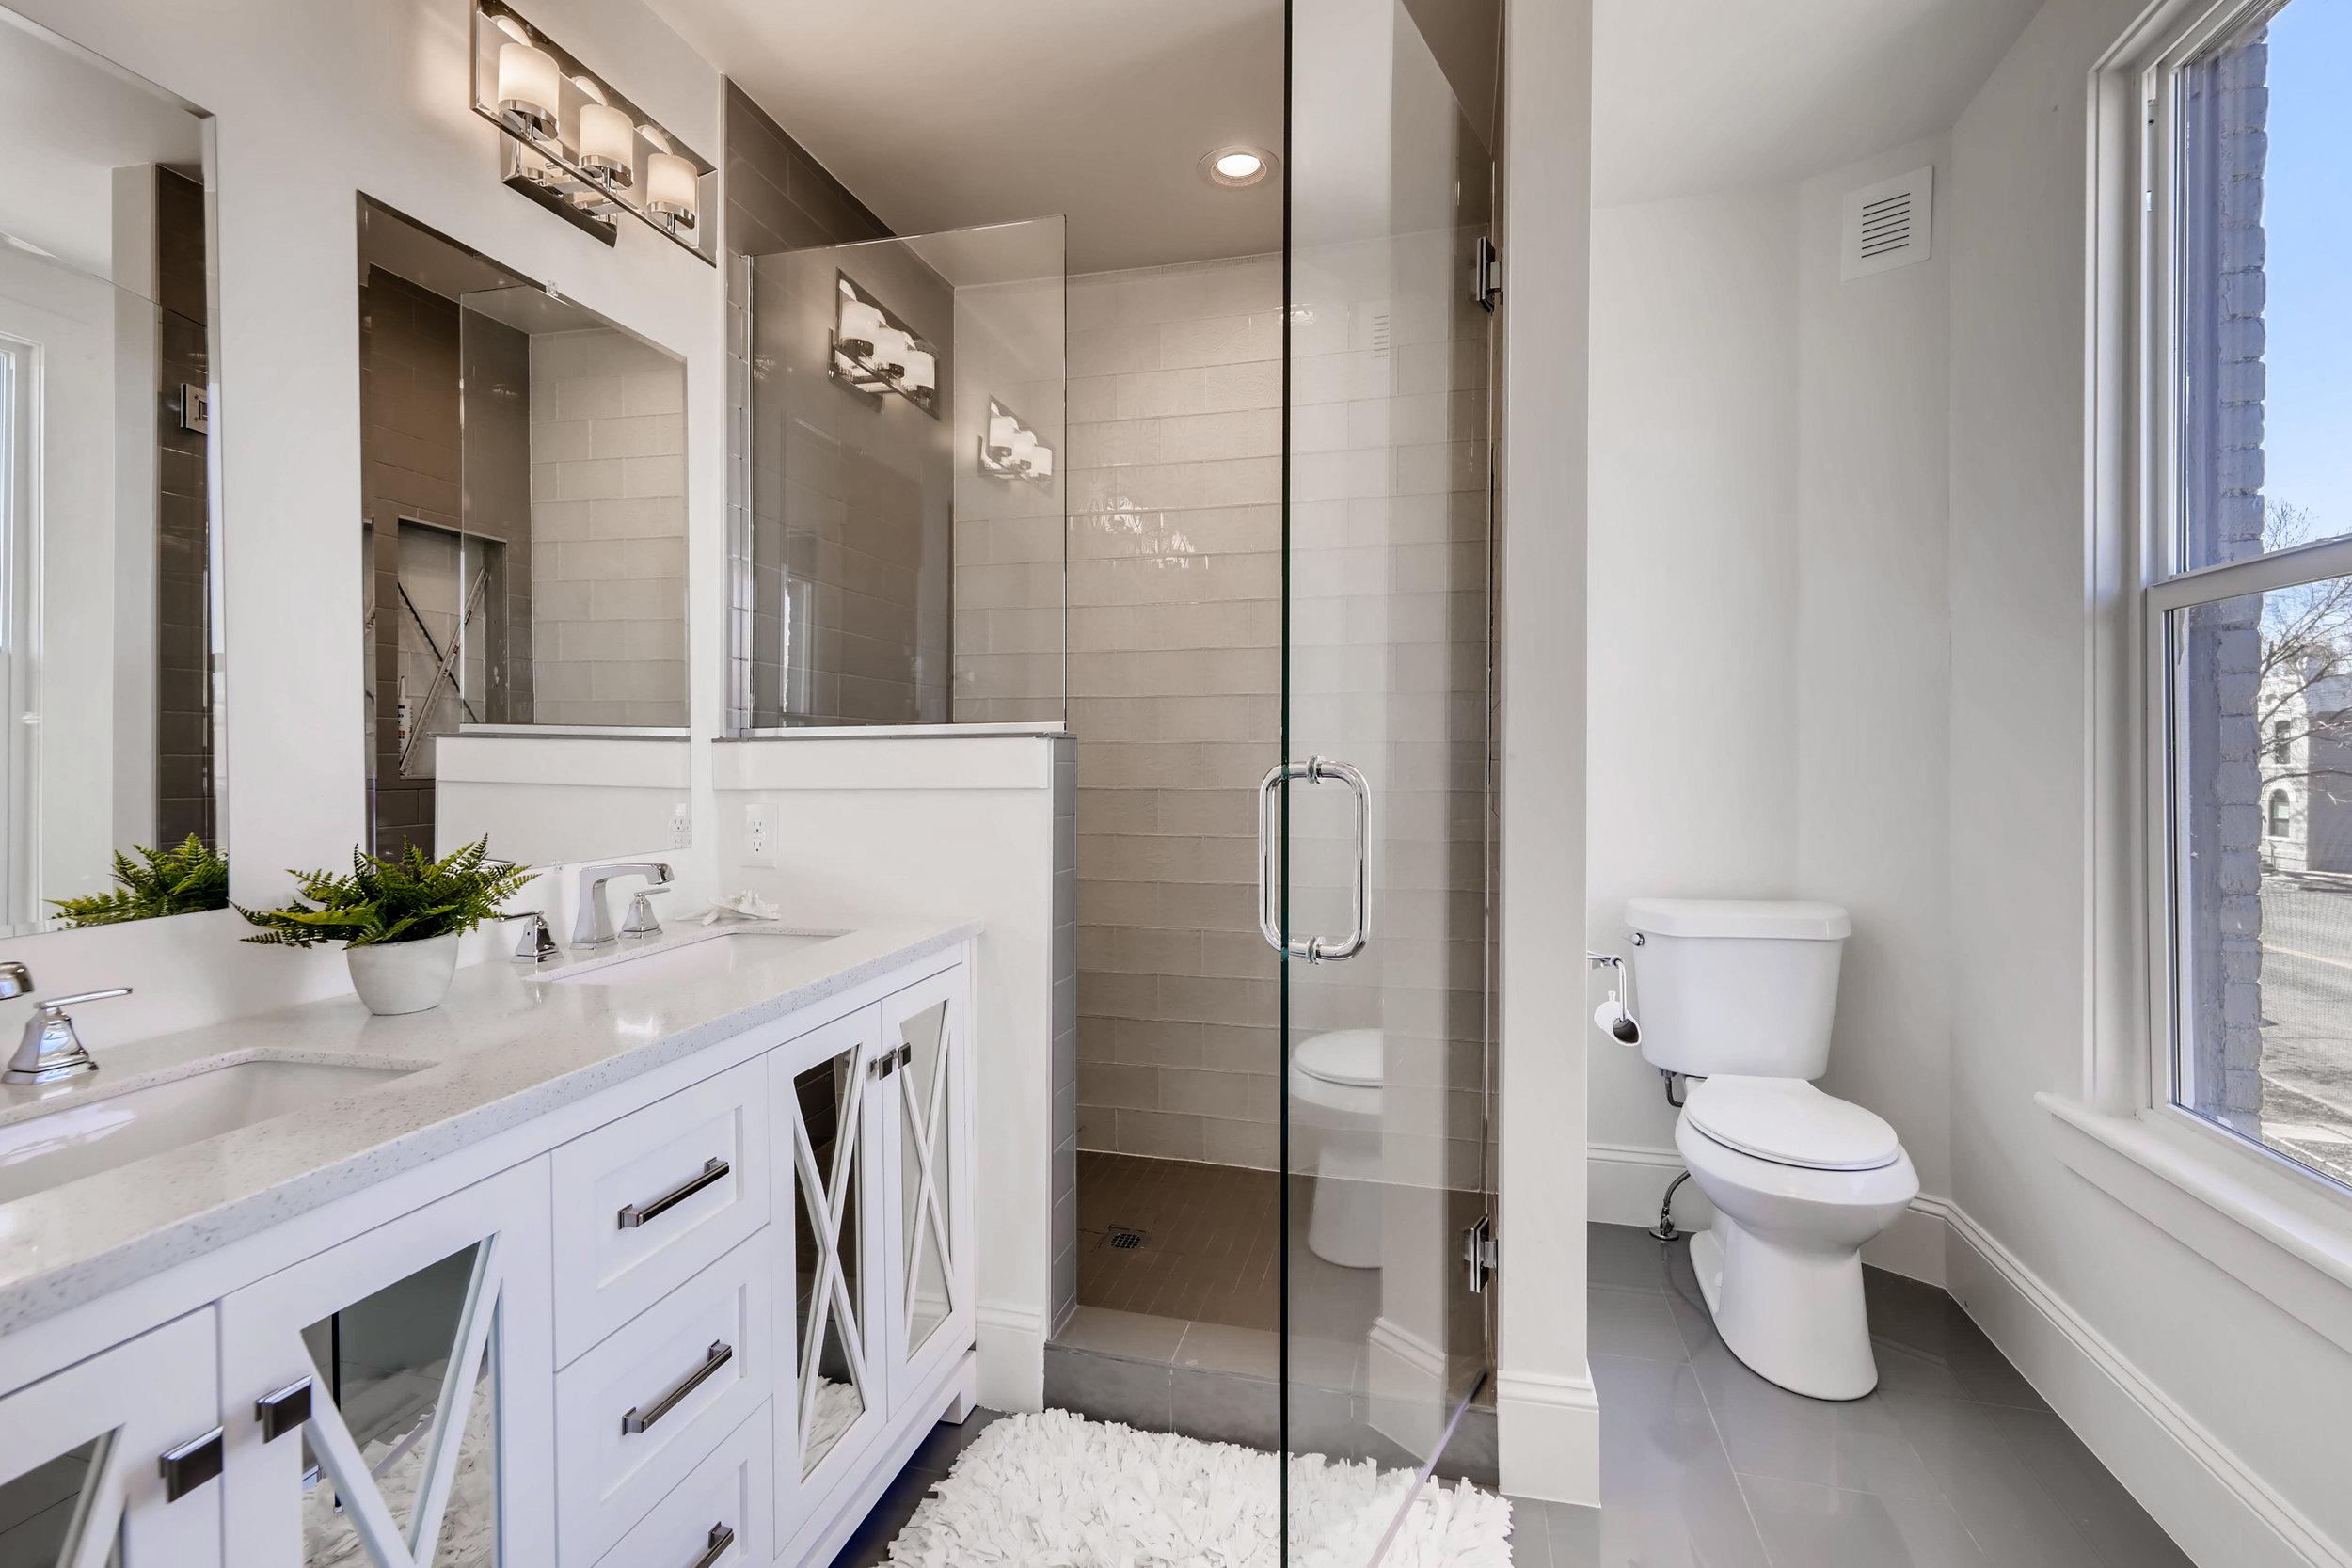 3616 Williams Denver CO 80205-print-021-32-2nd Floor Master Bathroom-3600x2400-300dpi.jpg